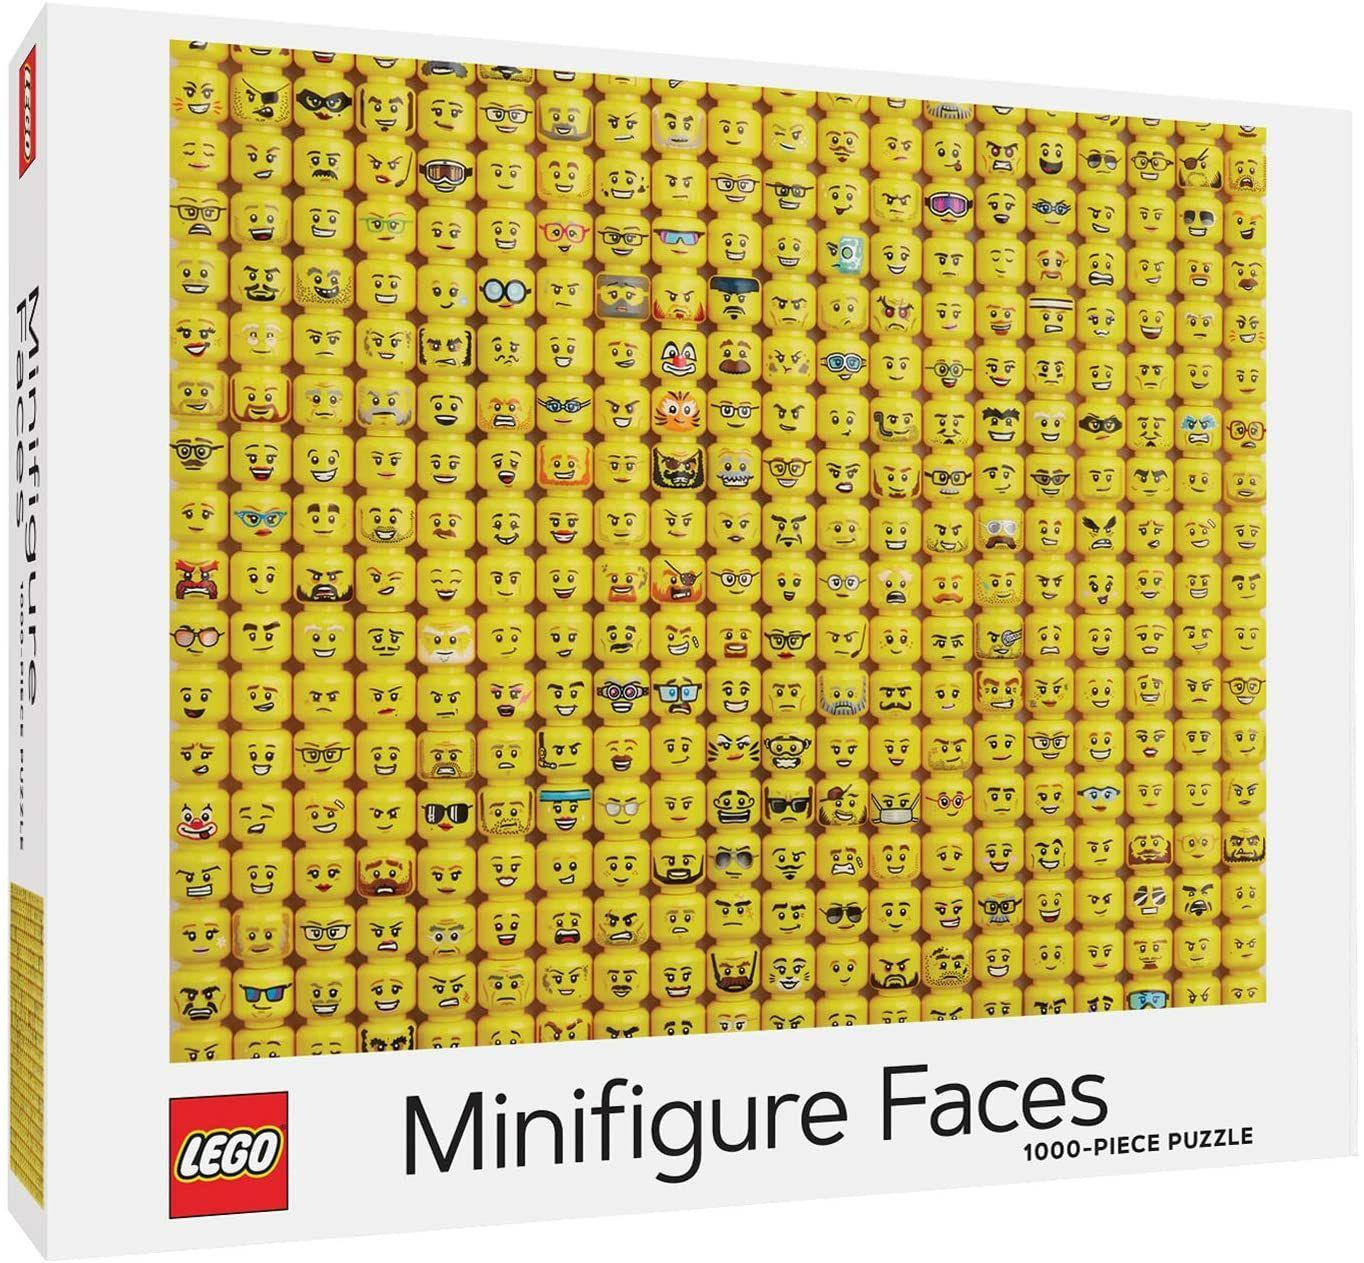 Lego Puzzle Miniature Faces